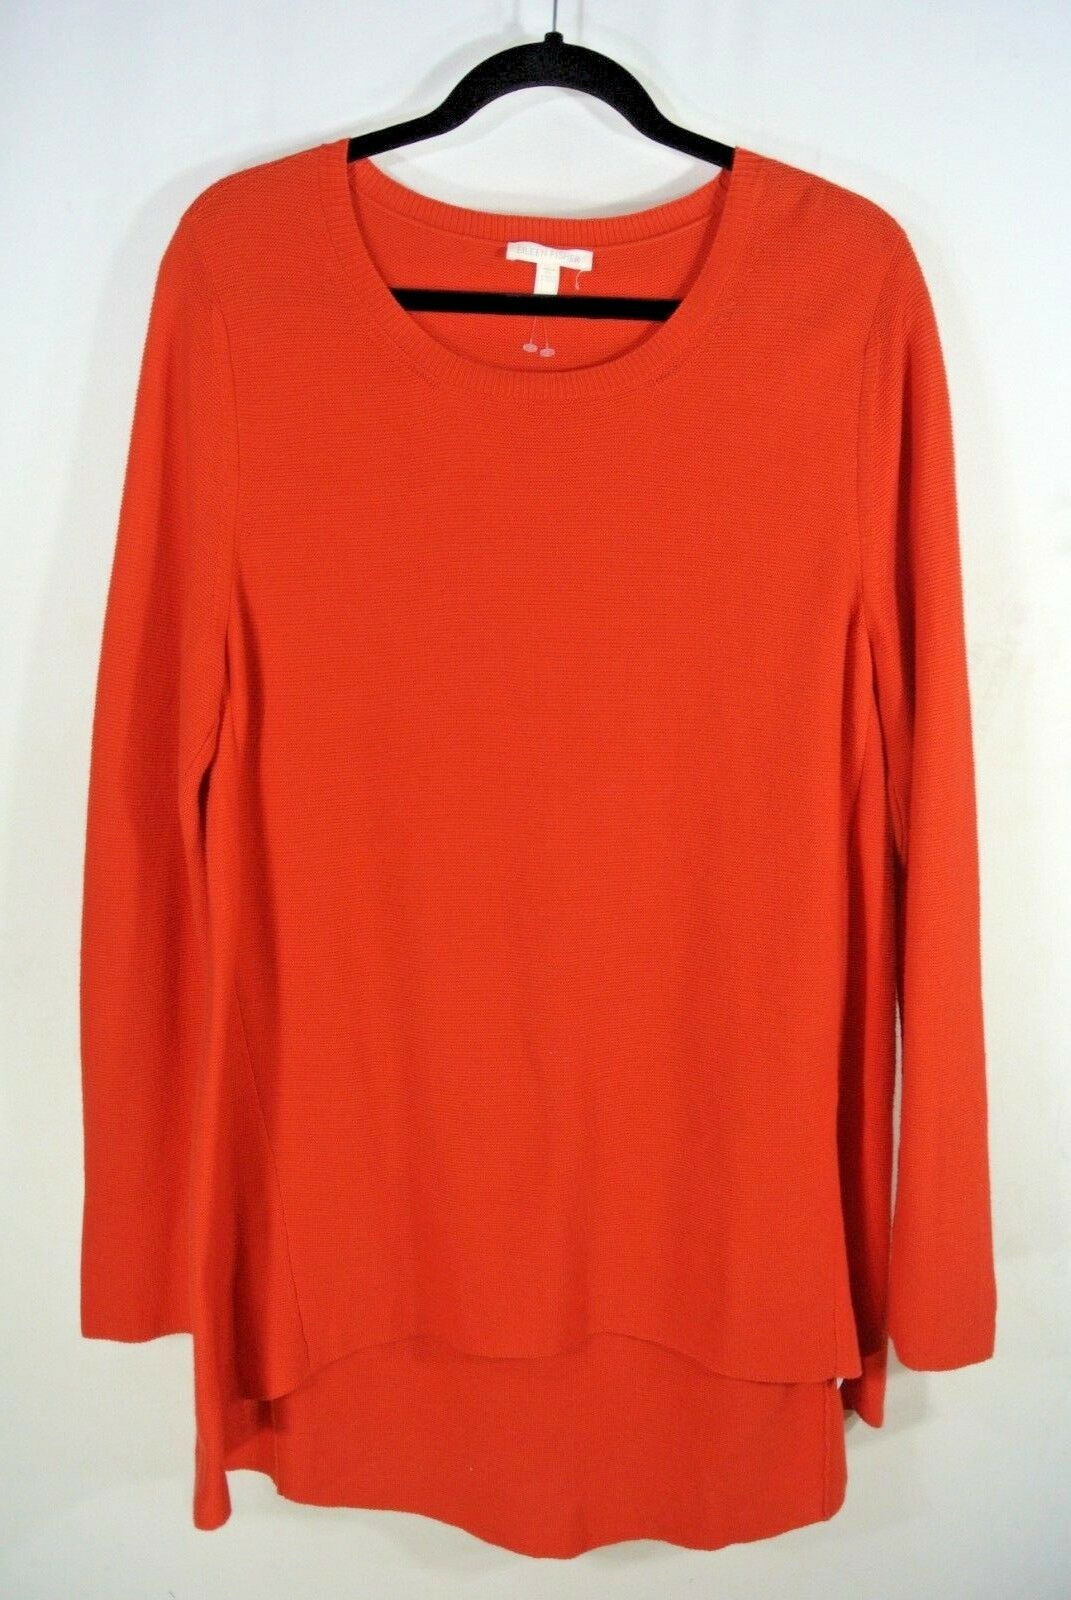 NEW Eileen Fisher Peruvian Organic Cotton Tunic, High-Low Hem in Lava - Größe M